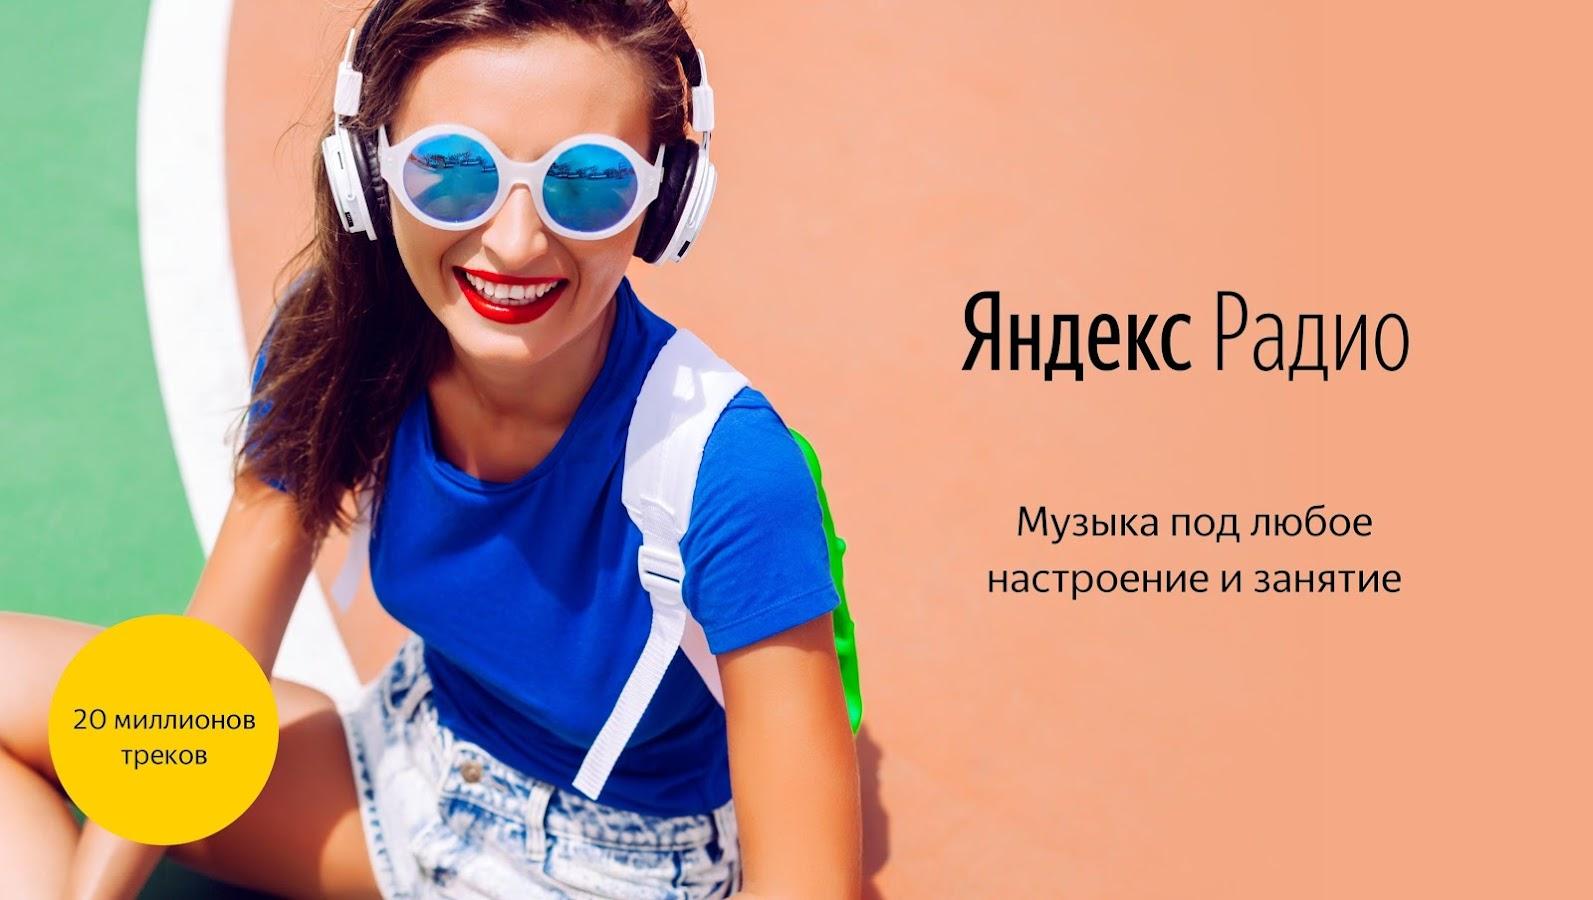 Журнал радио яндекс диск